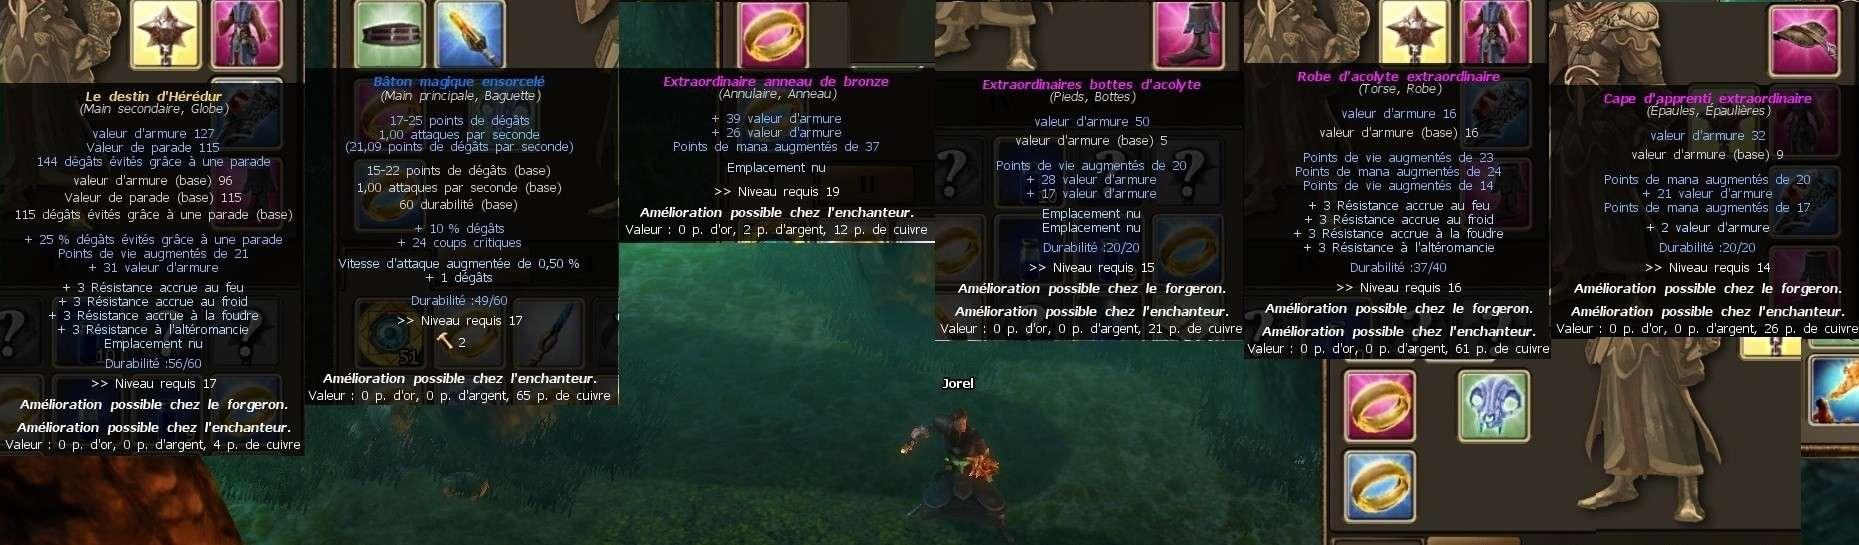 DrakenSang (f2p) Level_15